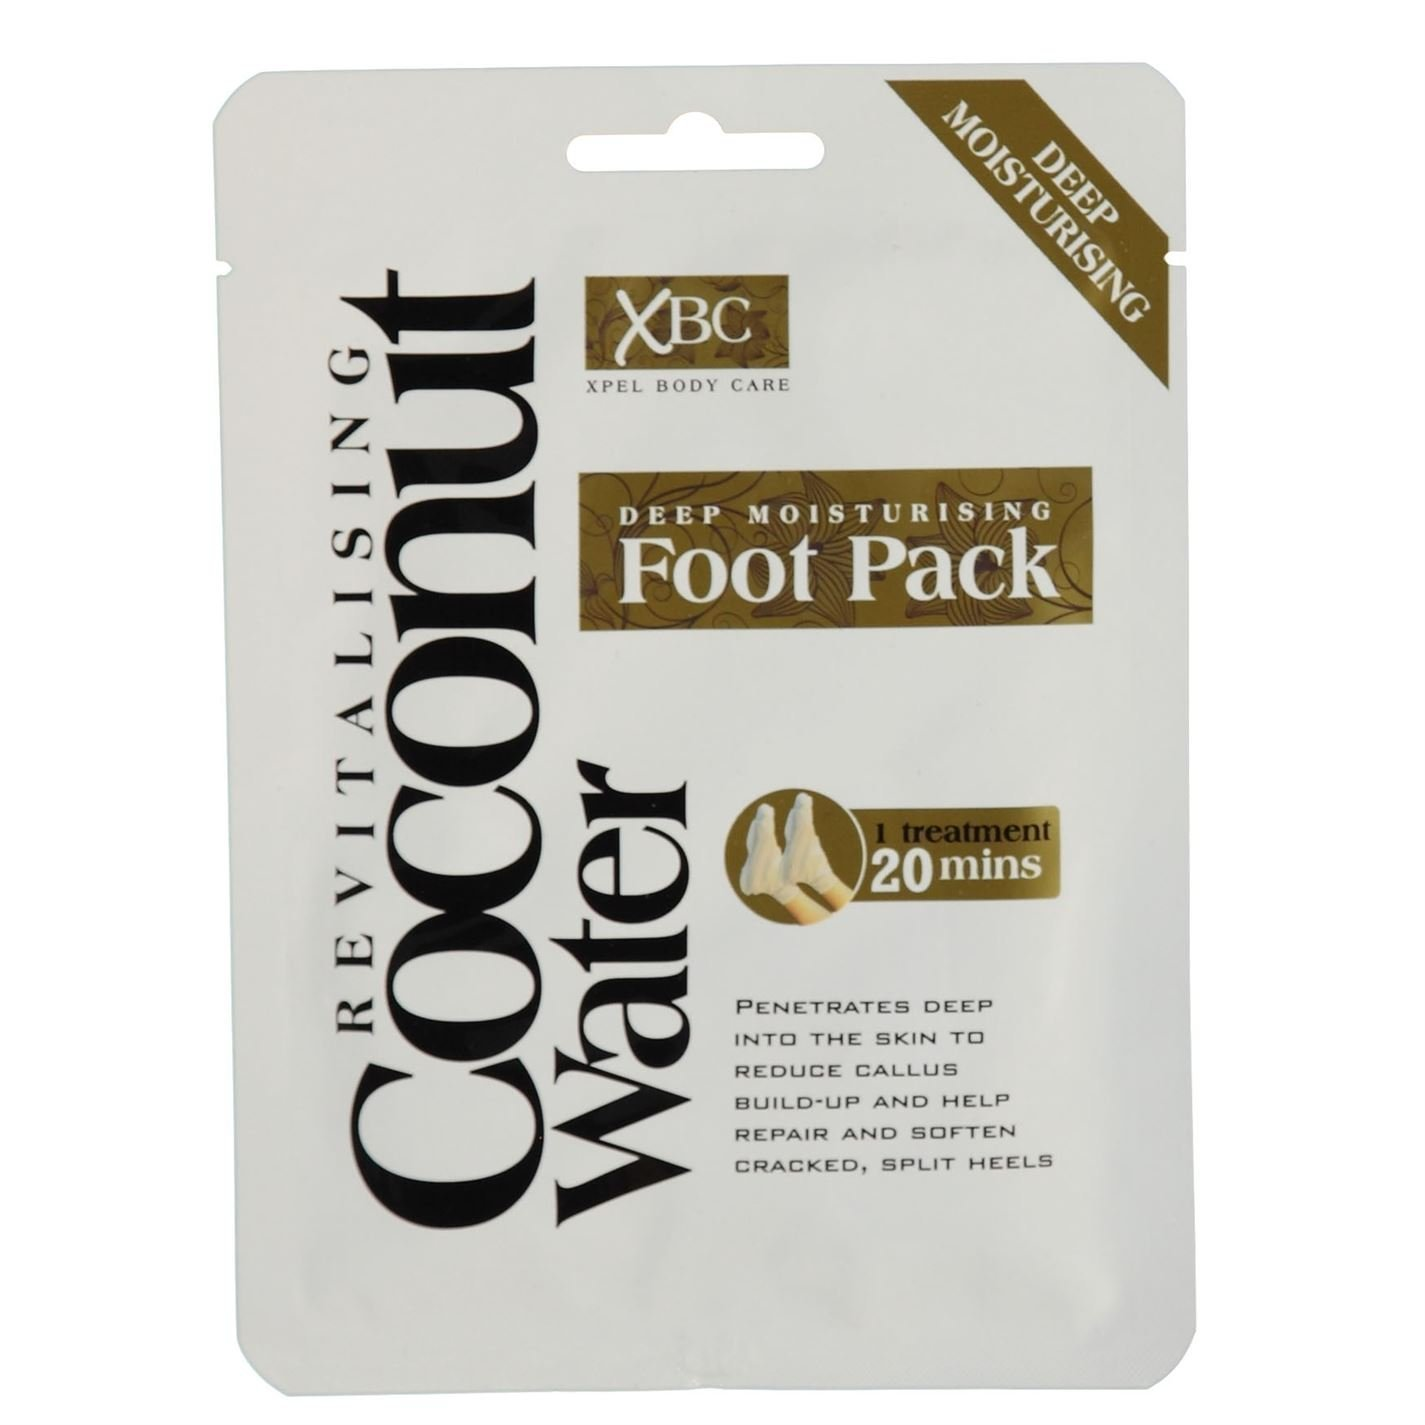 2 x XBC Xpel Body Care Treatment Deep Moisturising Revitalising Coconut Water Foot Pack Xpel Marketing